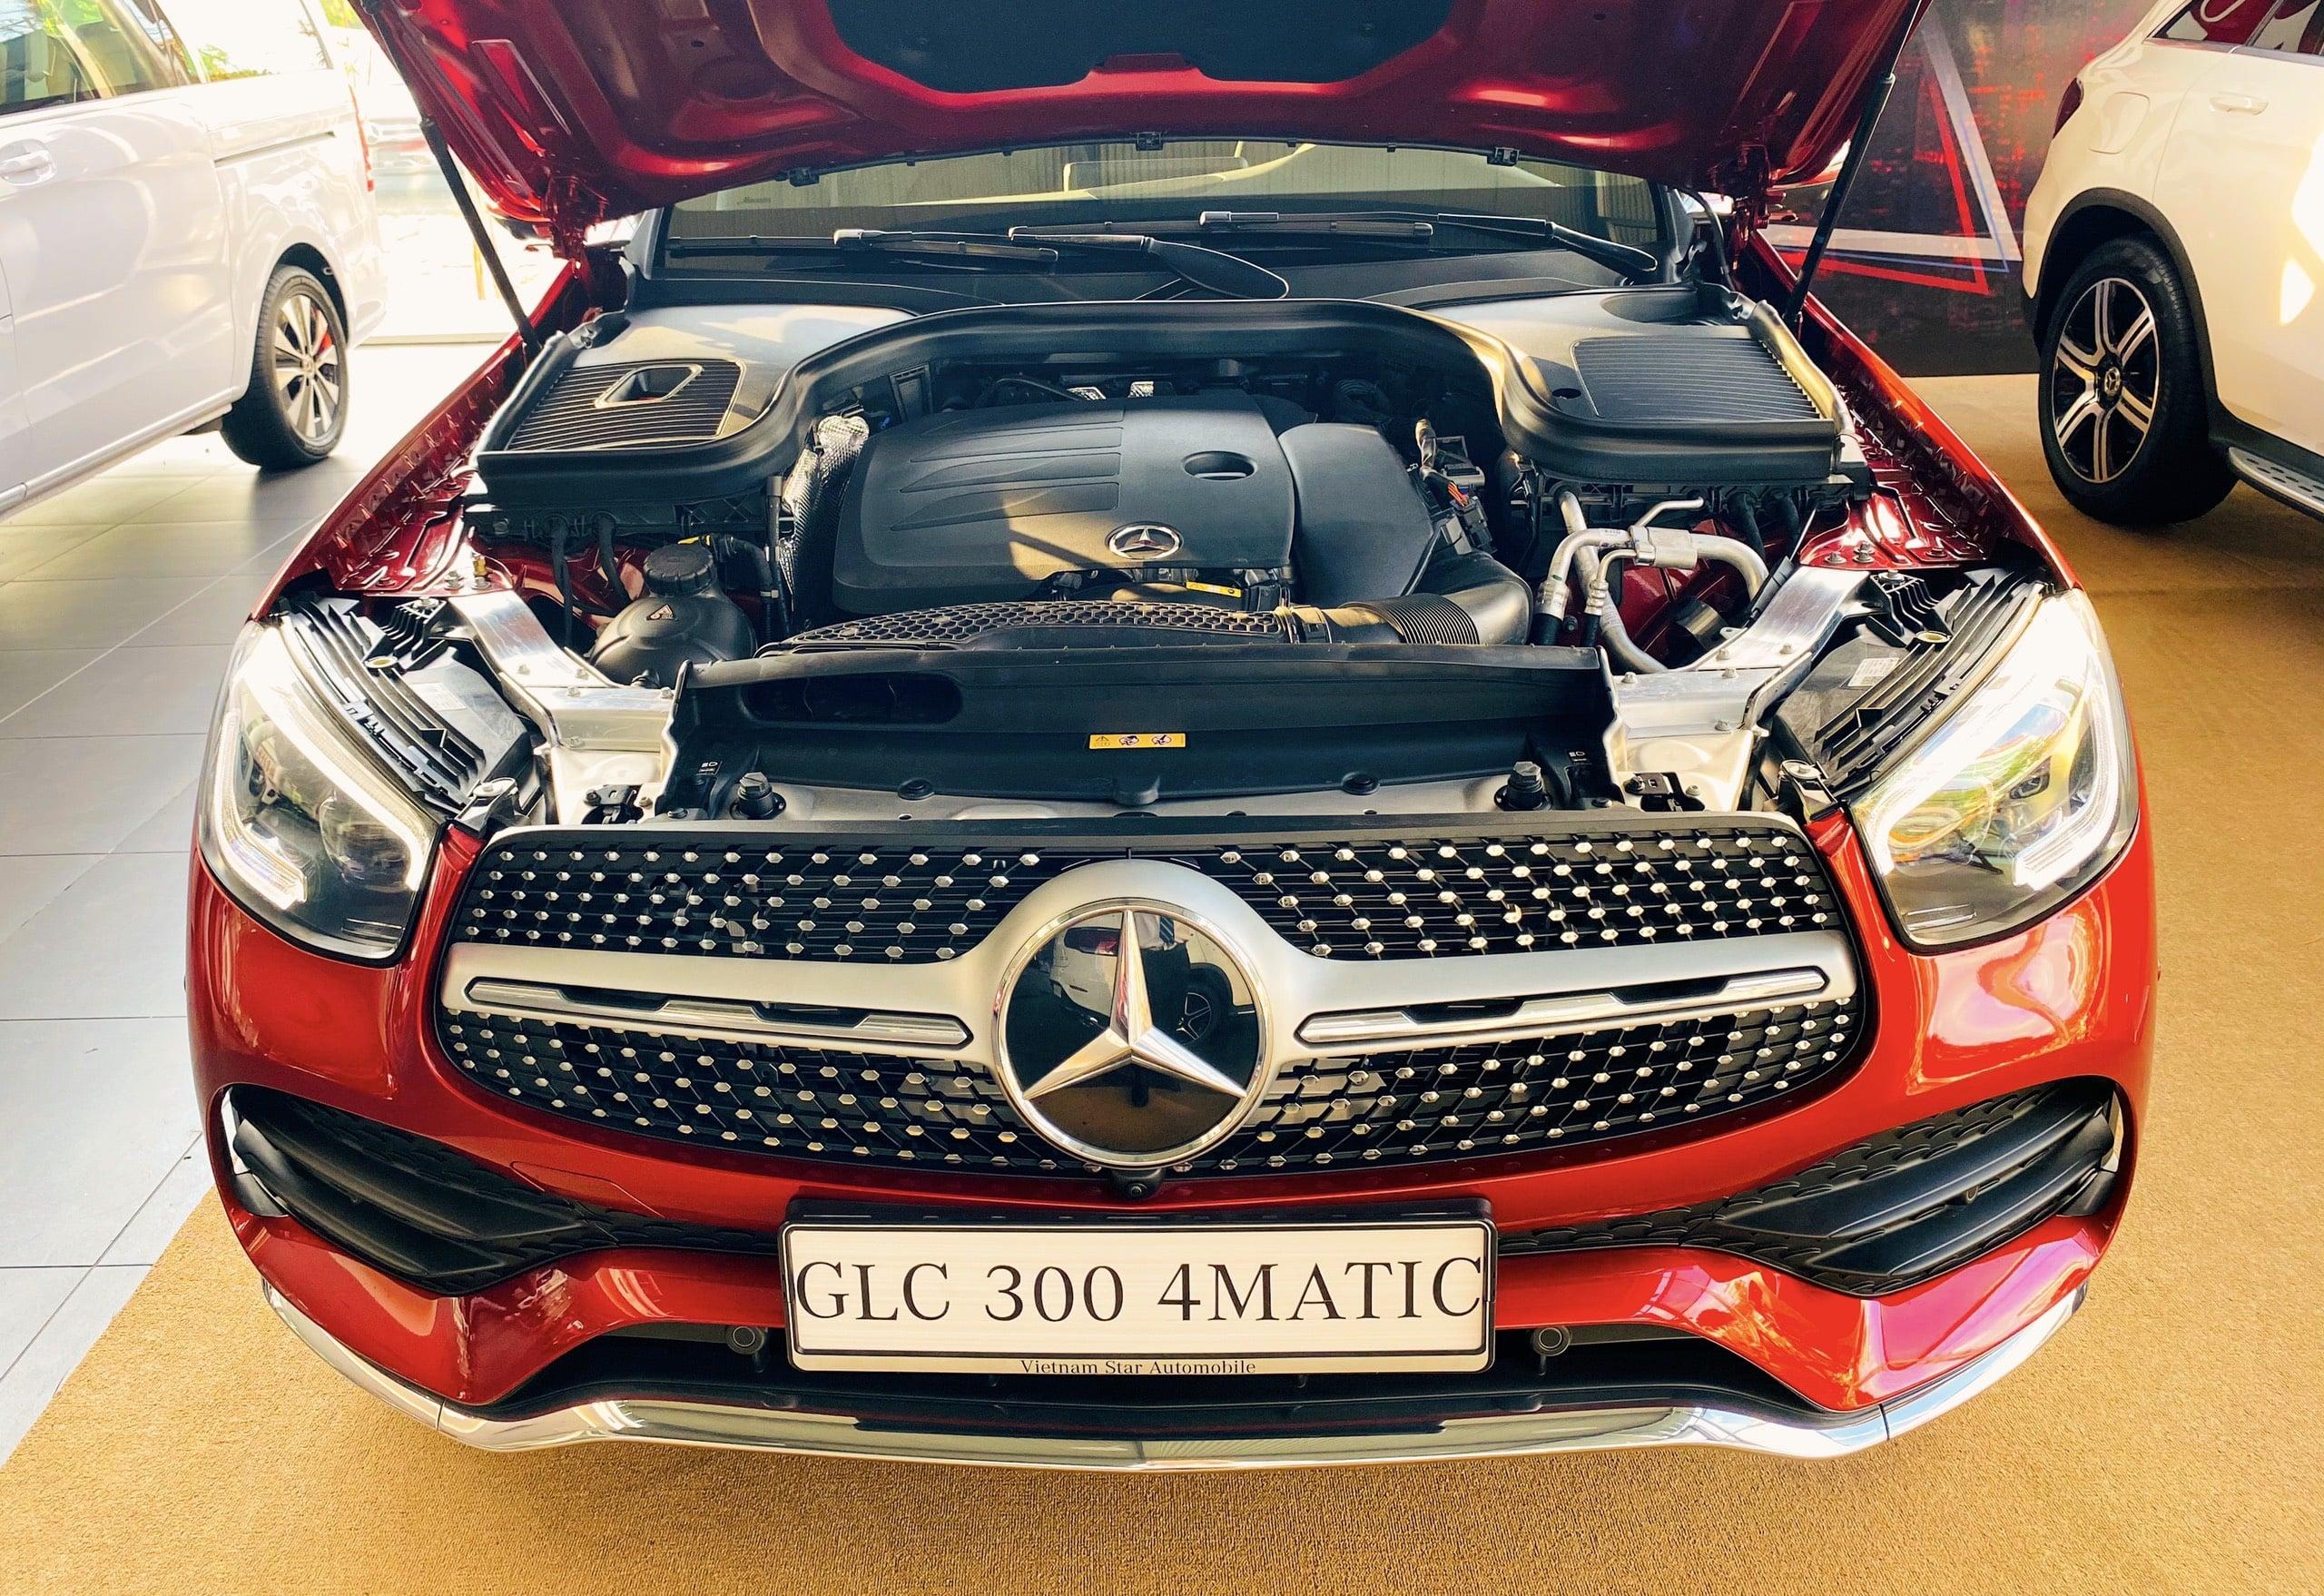 Mercedes GLC 300 4Matic 2022 Xe Mercedes (1)